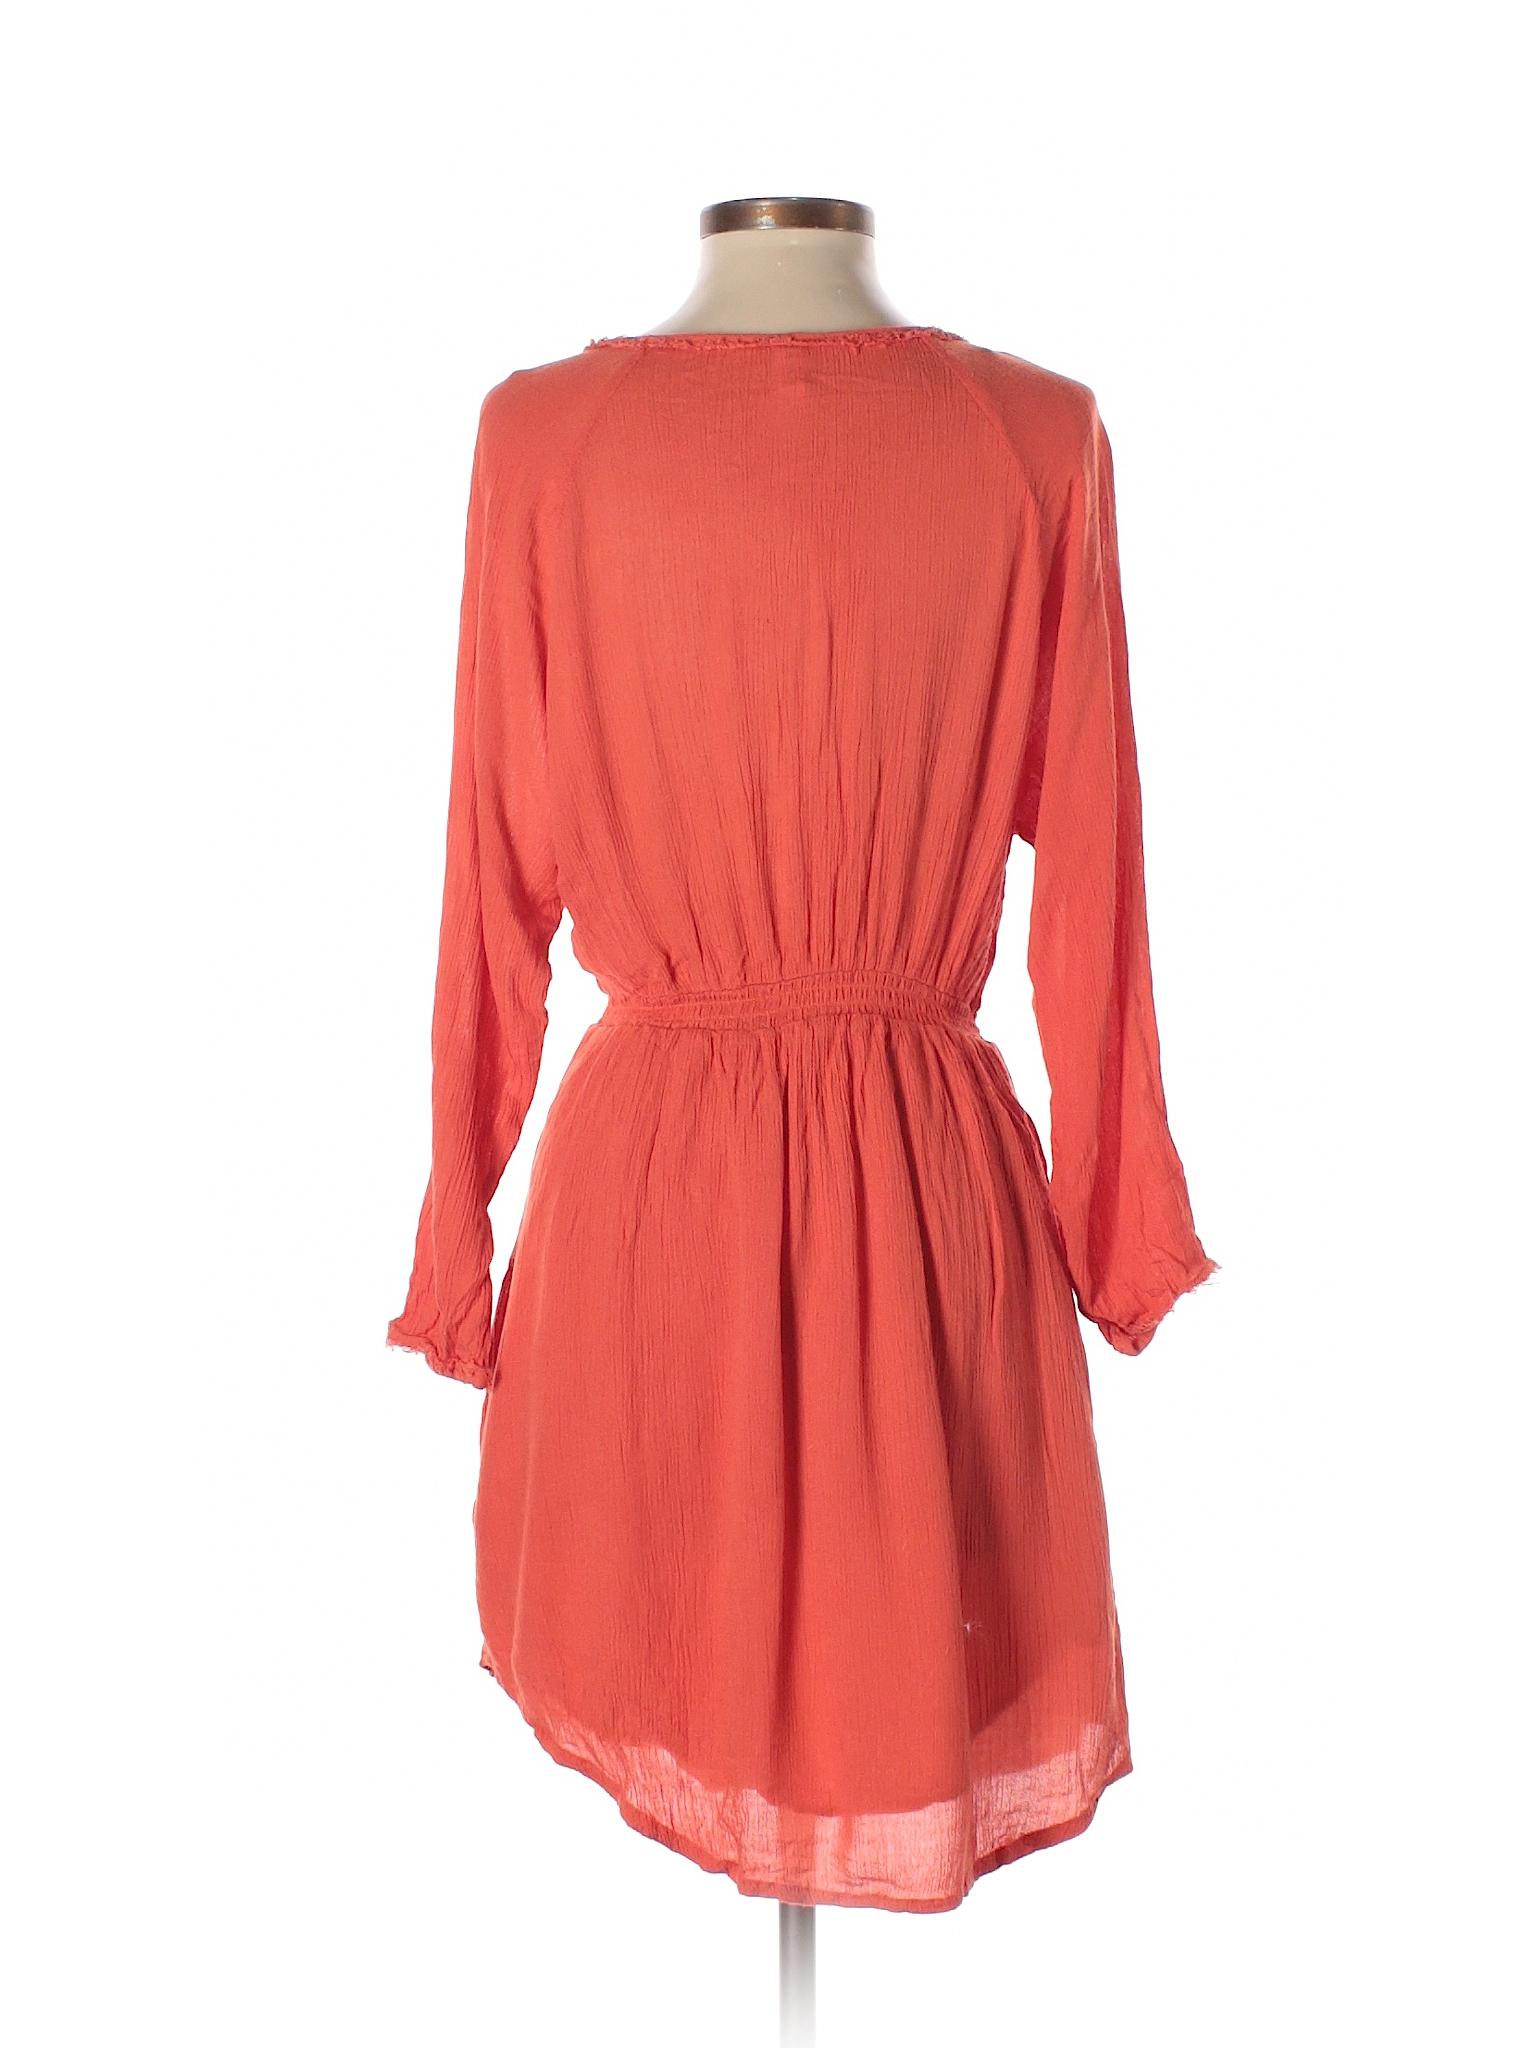 Fawn Casual Gentle winter Dress Boutique aPBqCSnv